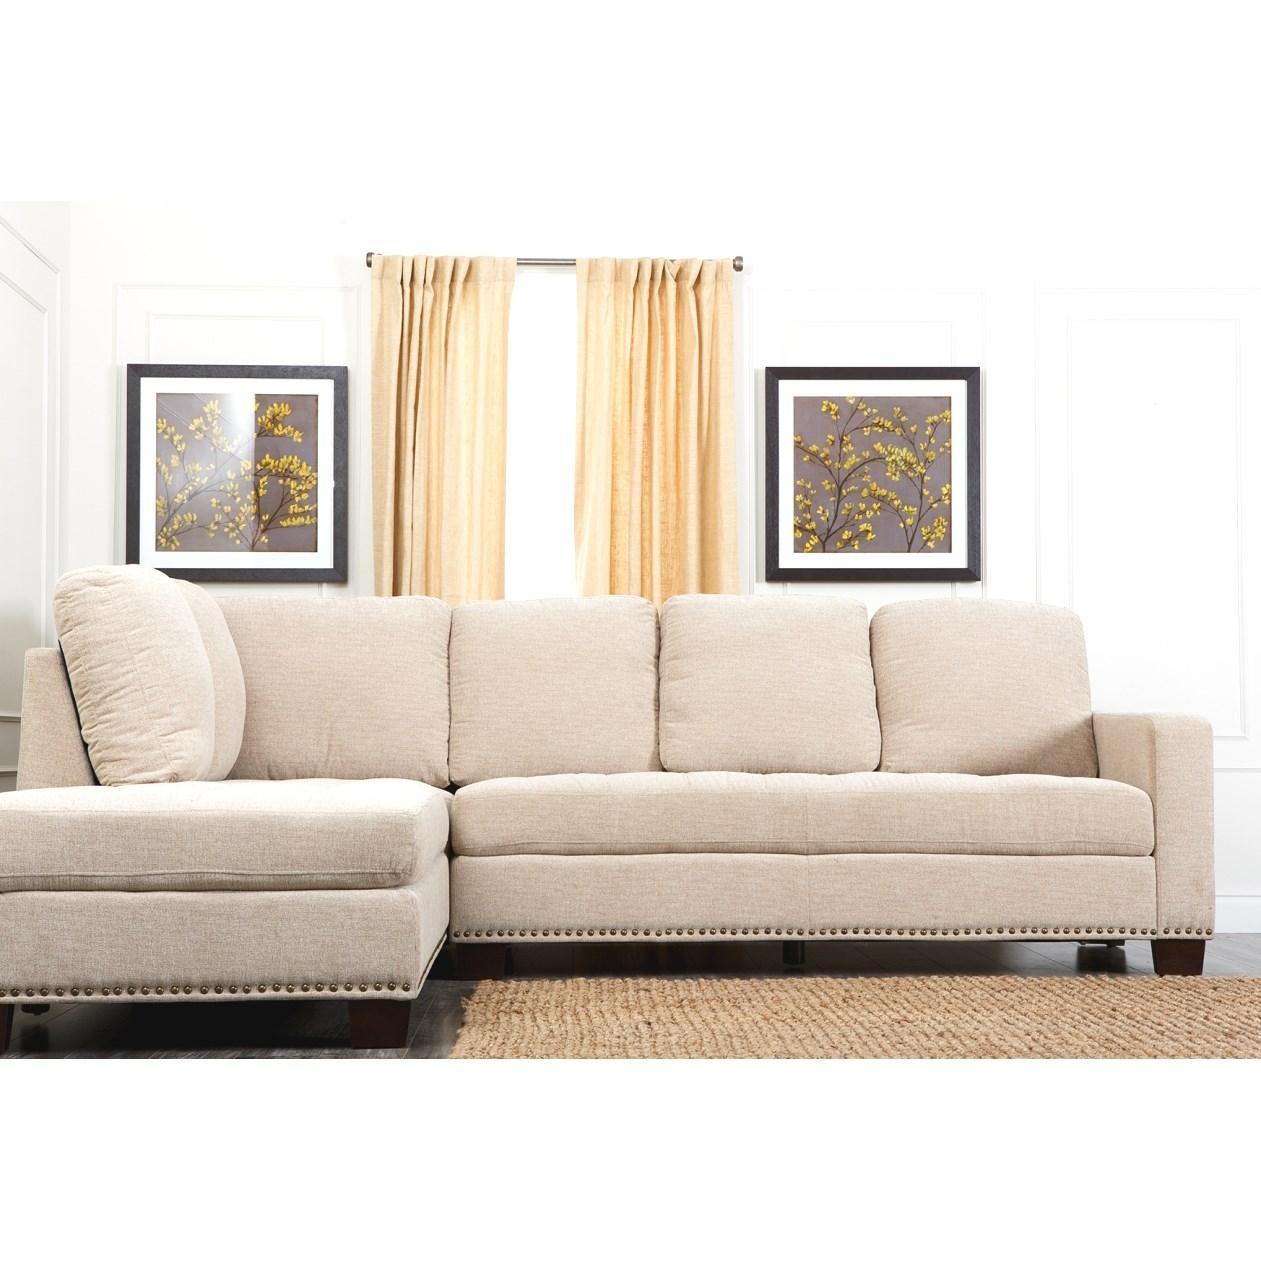 Abbyson Living Ci D10357 Crm Claridge Fabric Sectional In Cream With Abbyson Living Sectional (Image 6 of 15)